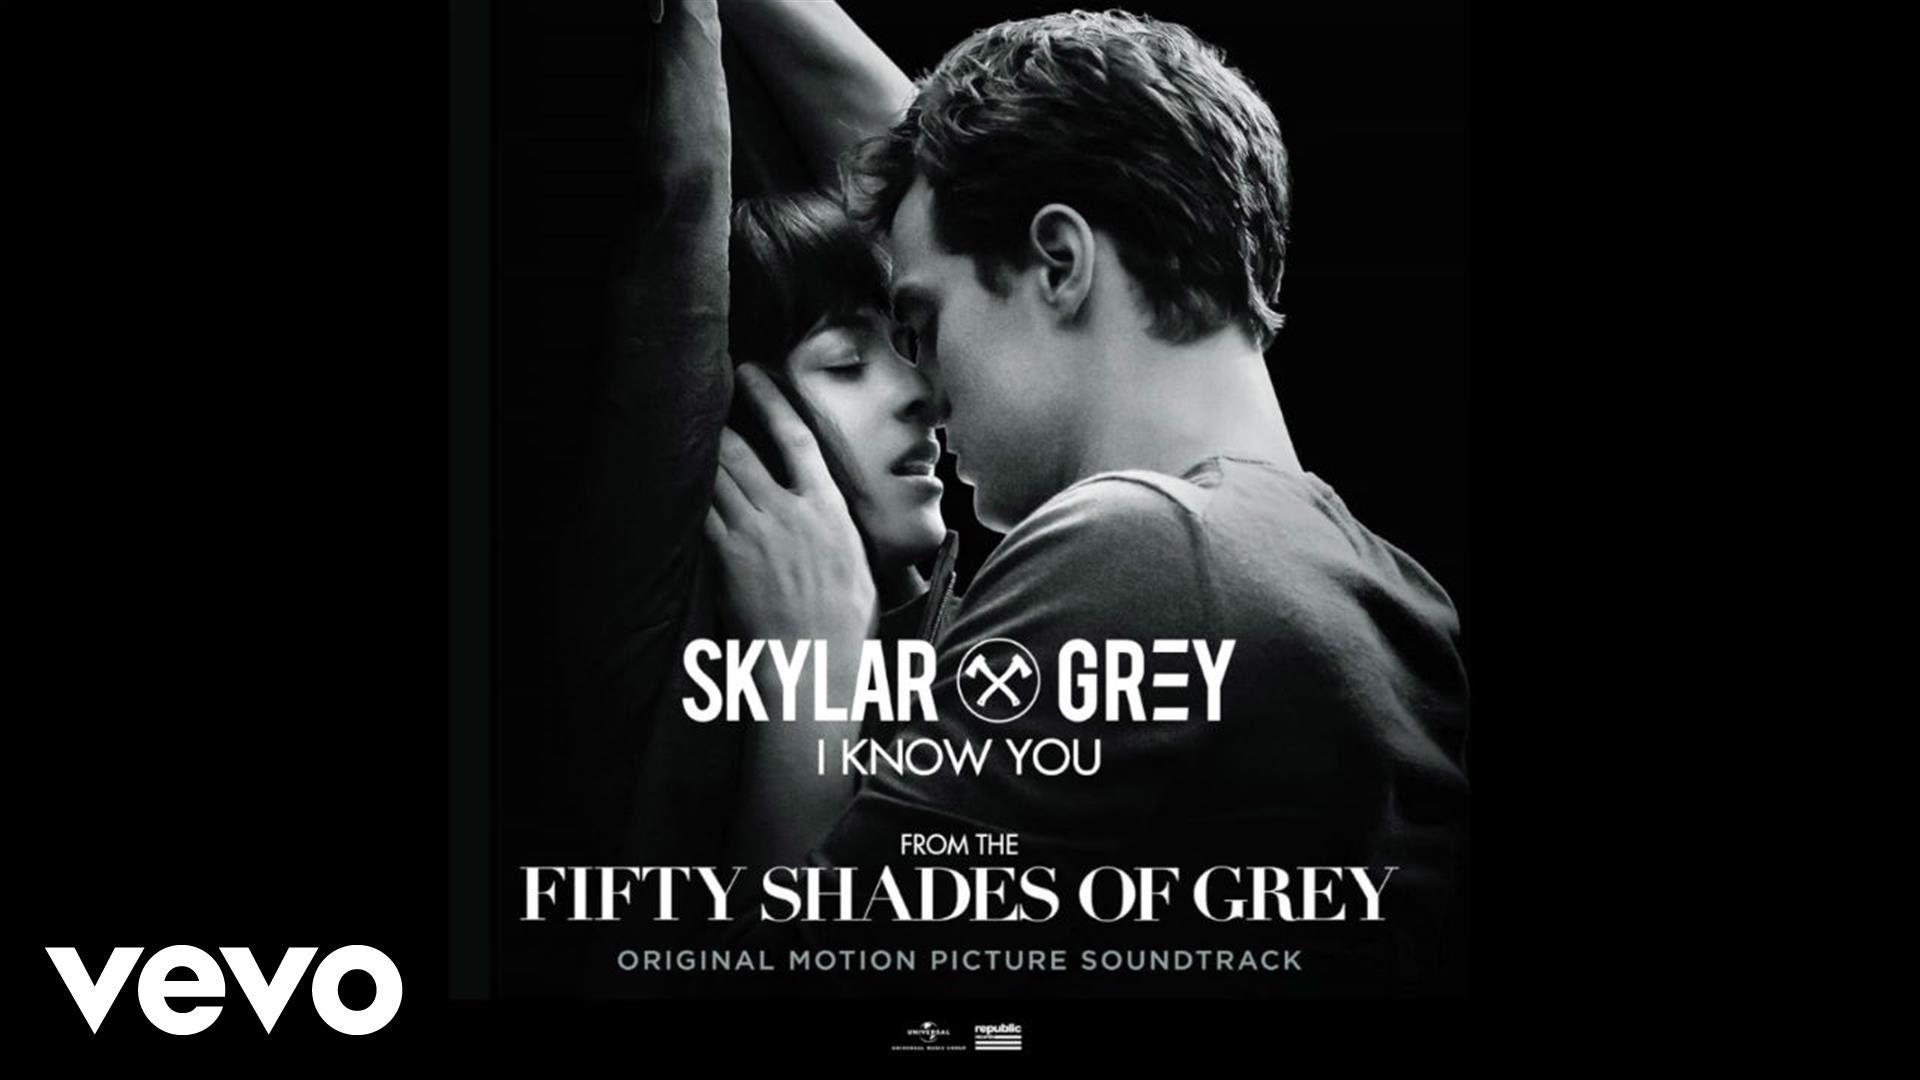 Skylar Grey – I Know You (Fifty Shades Of Grey) (Lyric Video) – YouTube